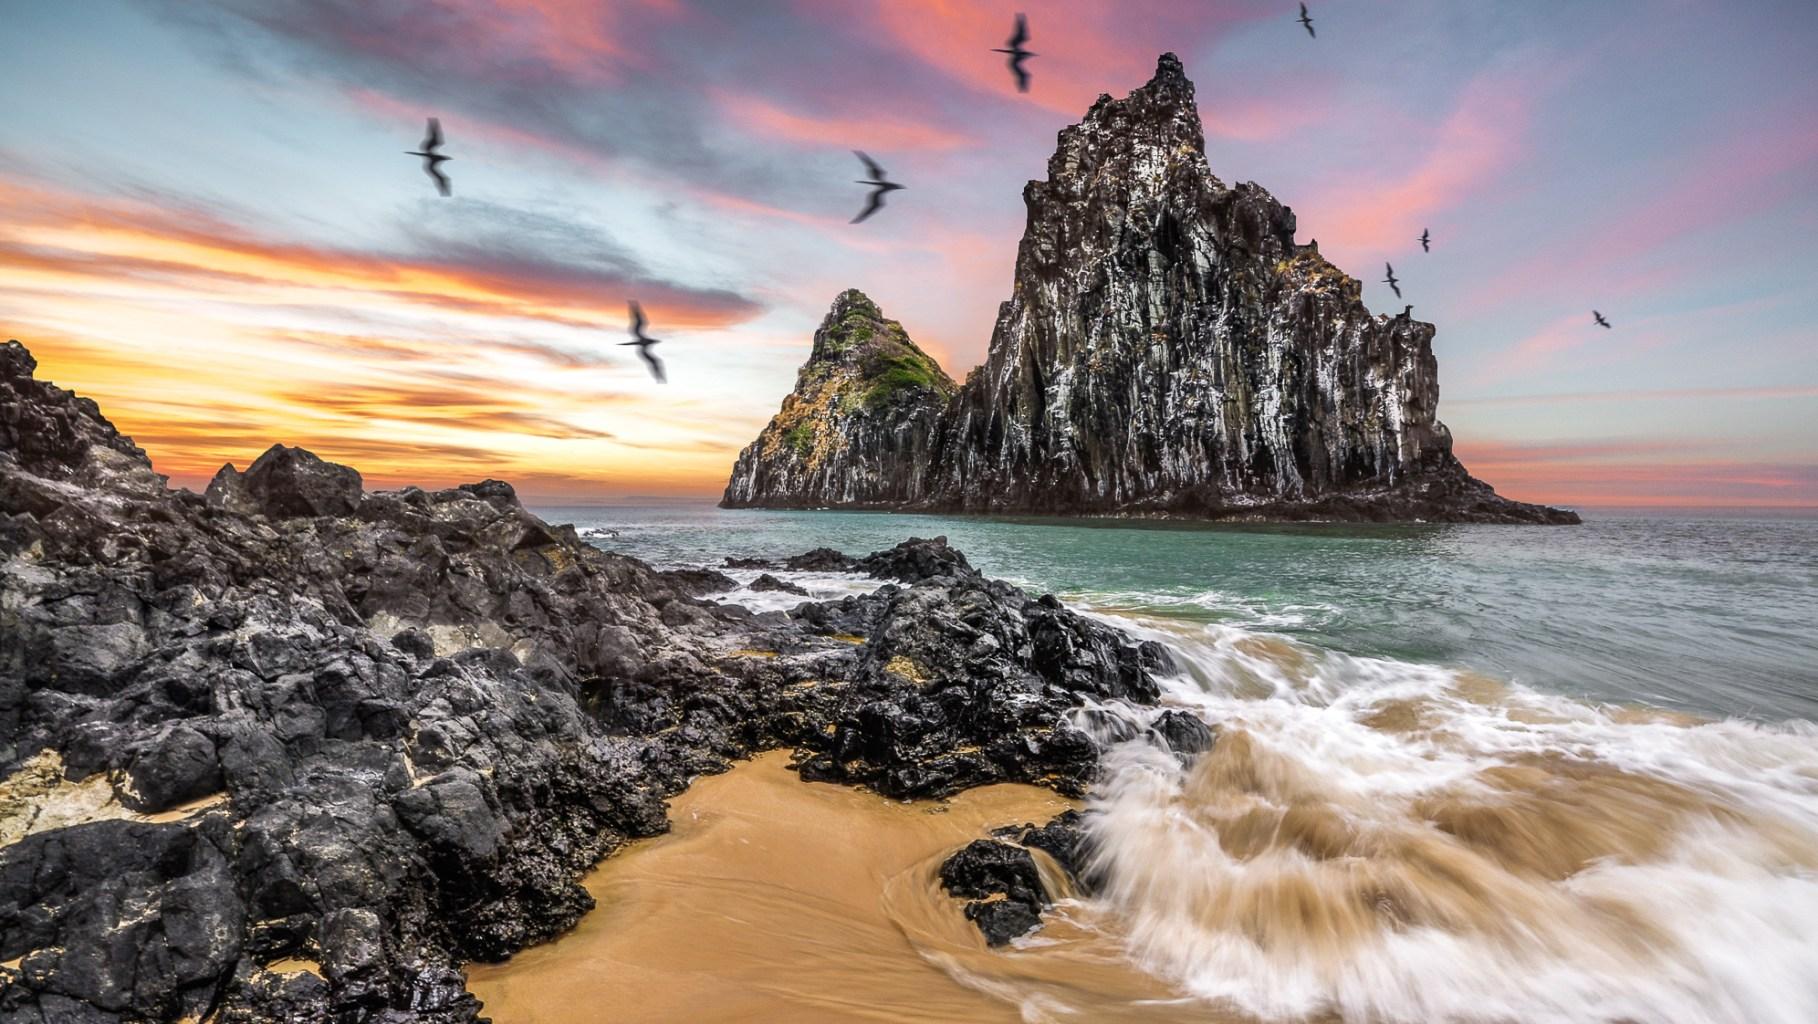 Image: Sea Birds Swirl around a beach overlooking a rocky outcrop